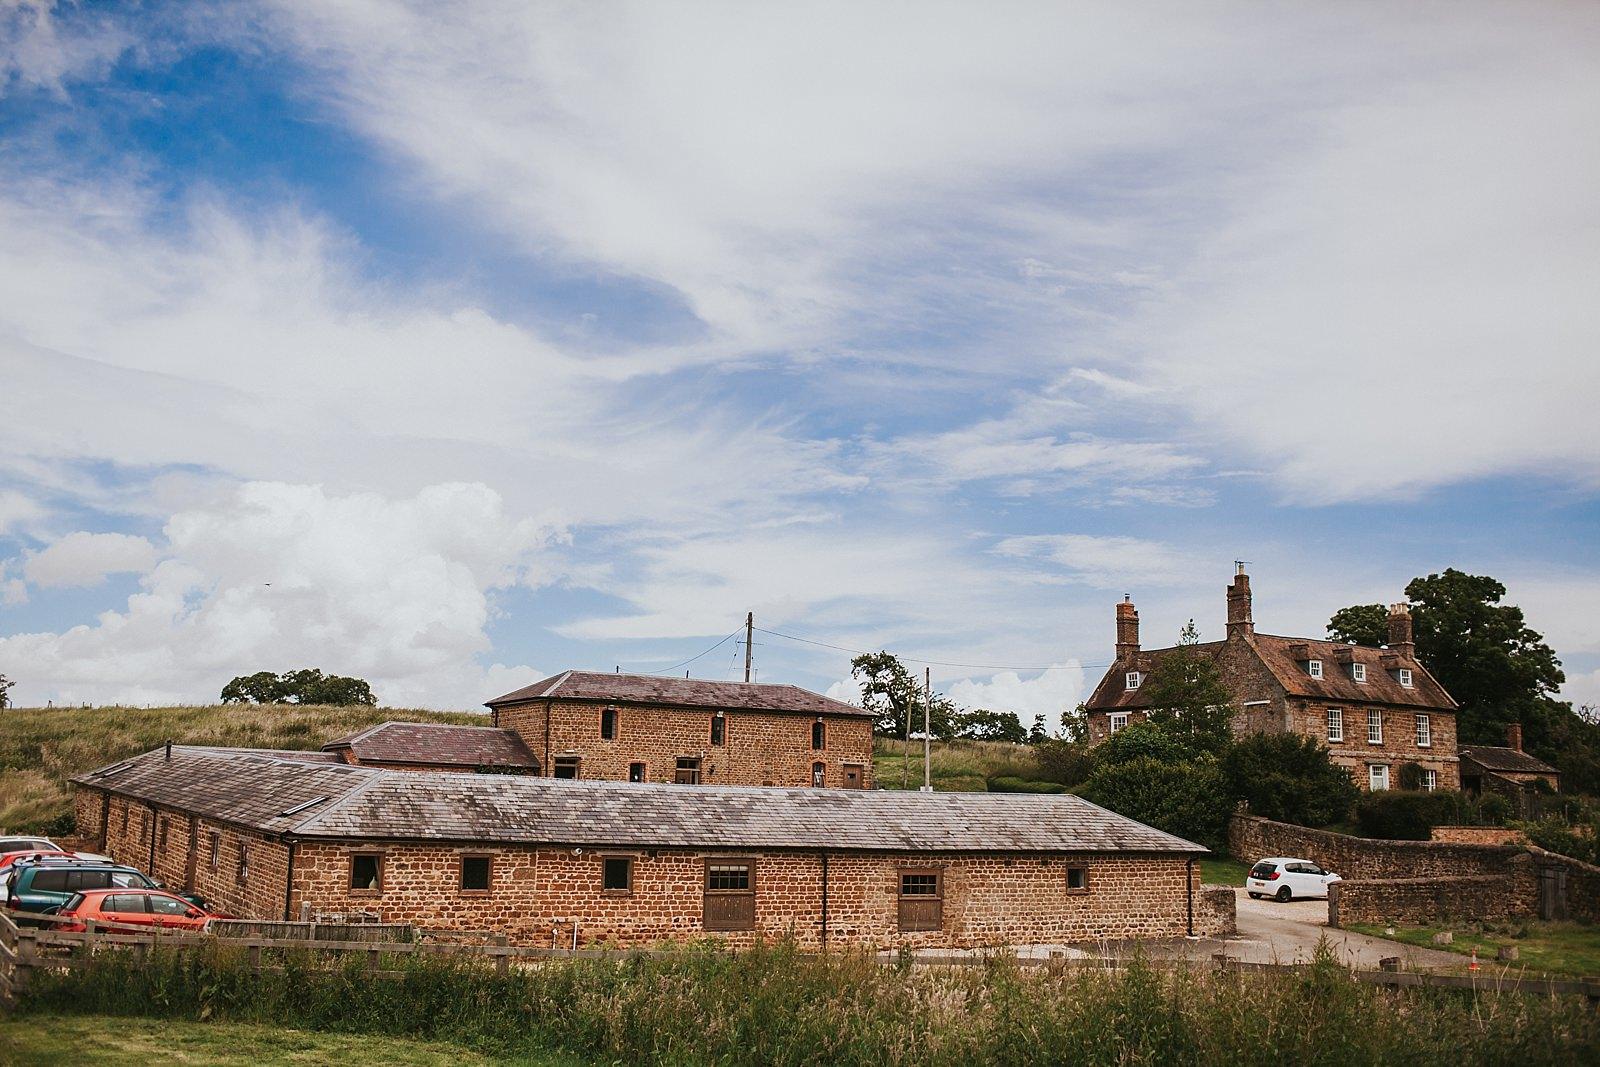 granary-at-fawsly-wedding-paula-stephen-014